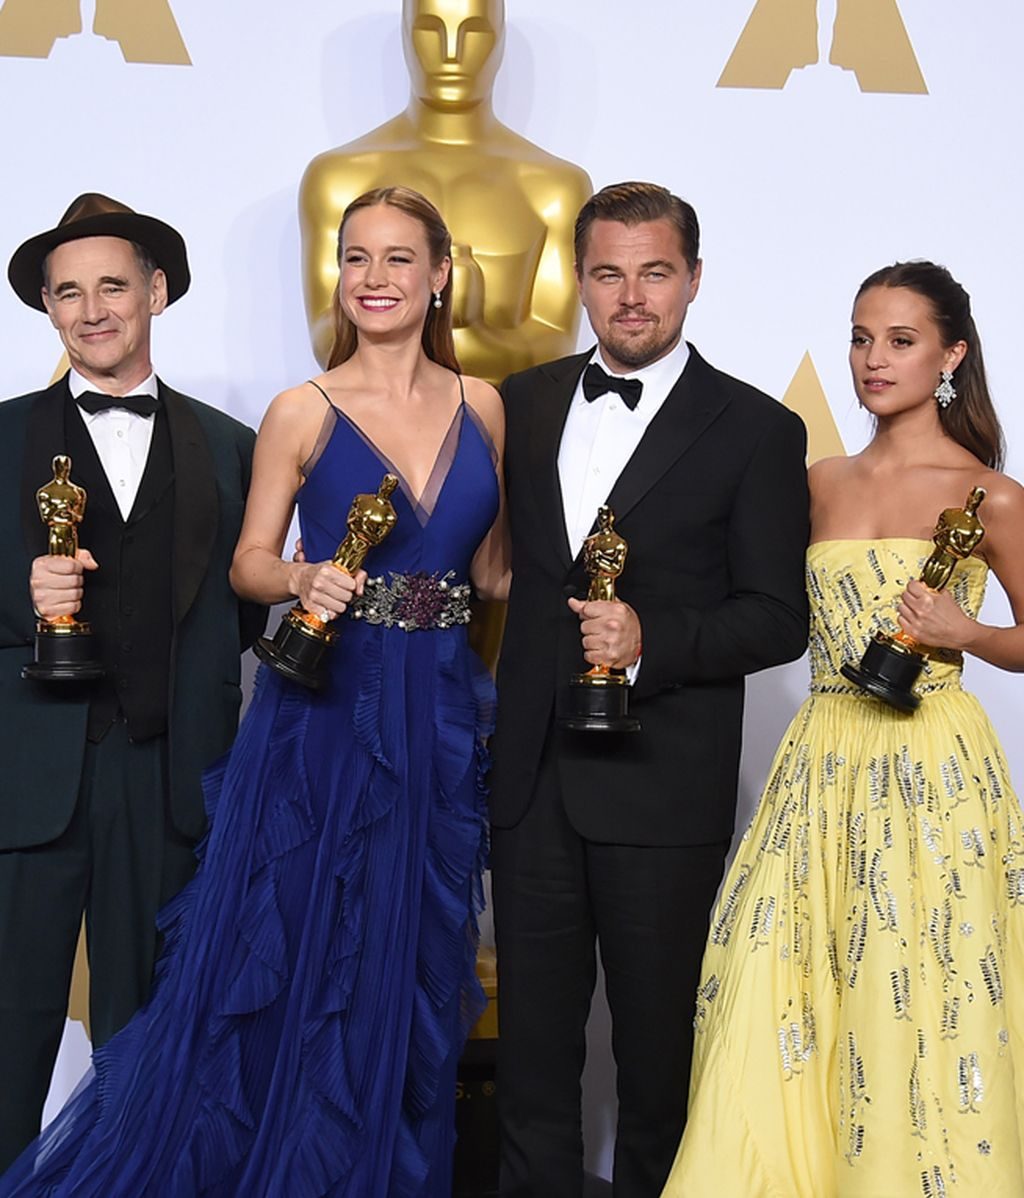 Mark Rylance, Brie Larson, Leonardio DiCaprio y Alicia Vikander